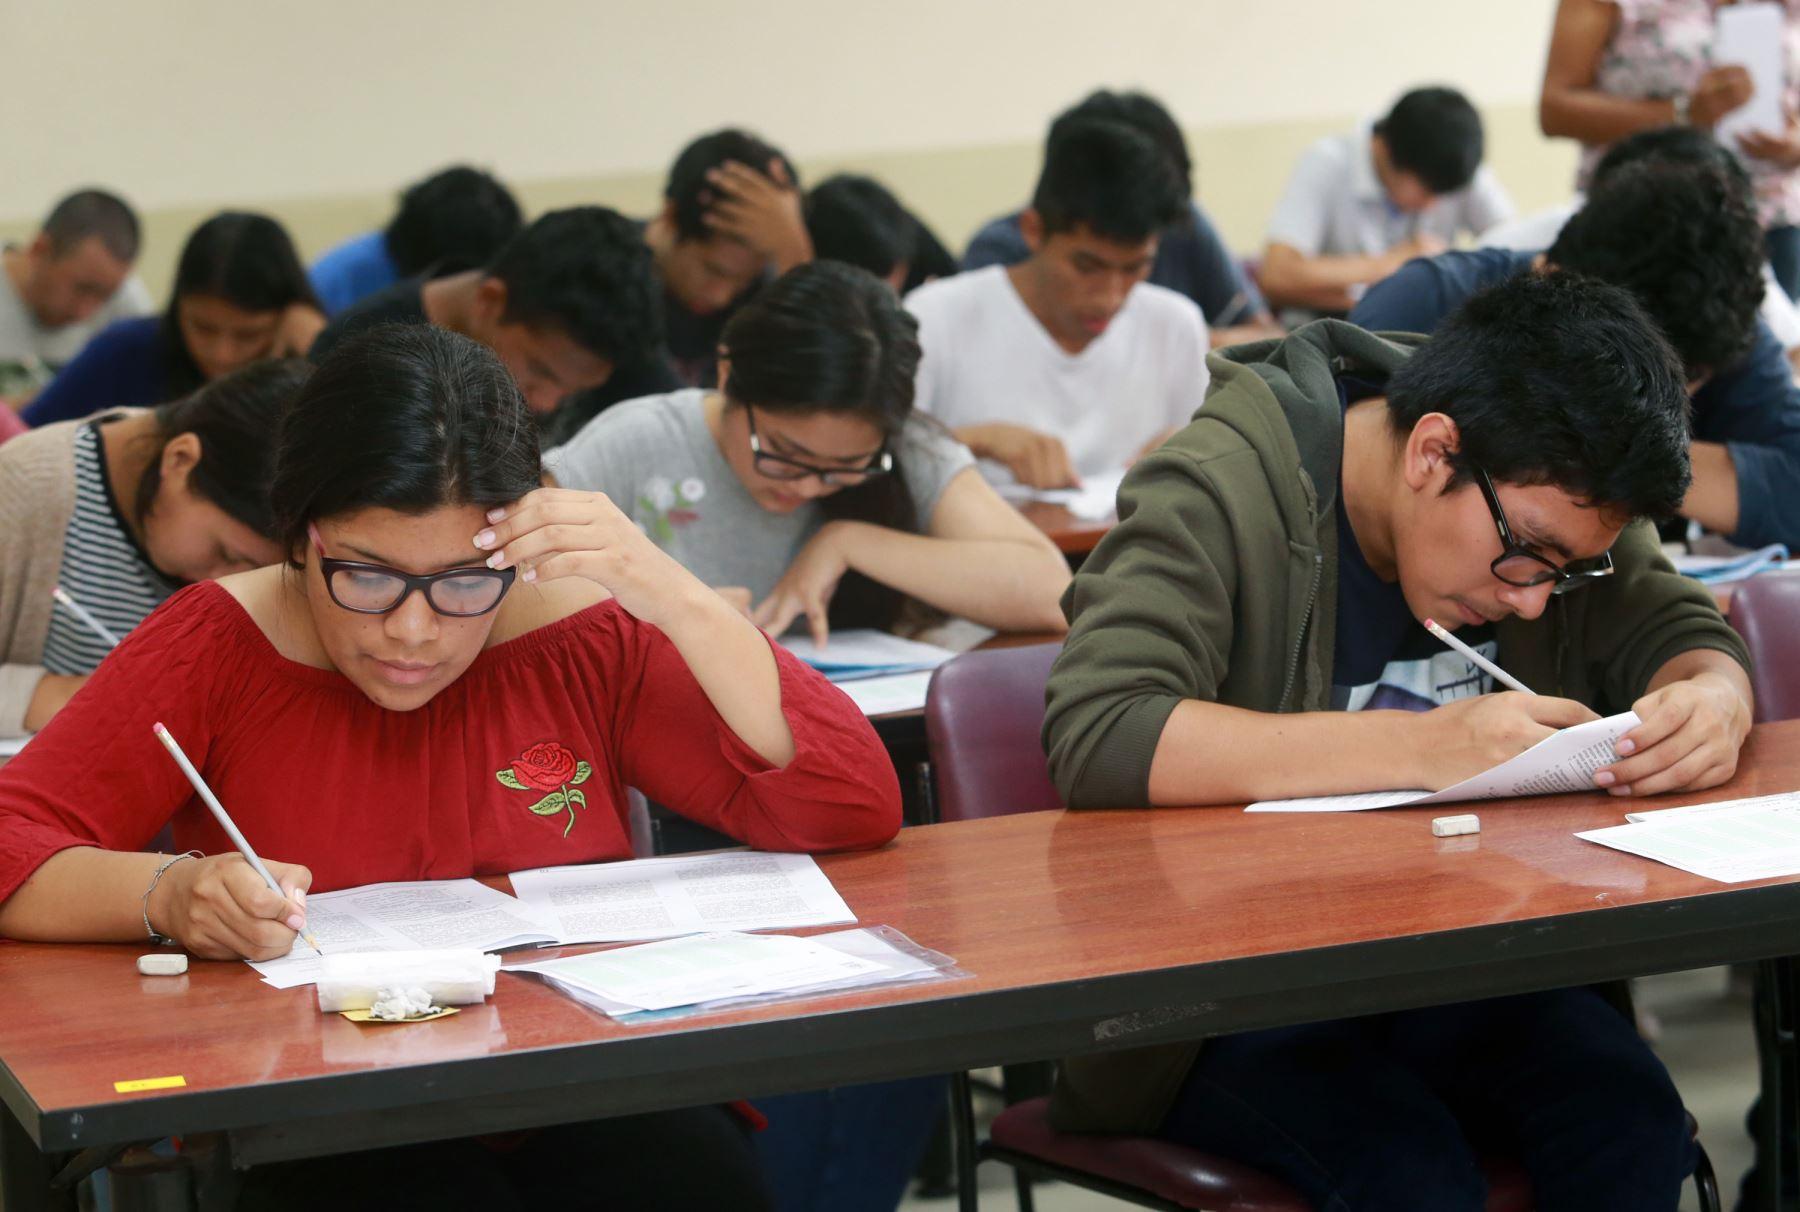 Examen de admisión UNI 2019-1. Foto: ANDINA/Norman Córdova